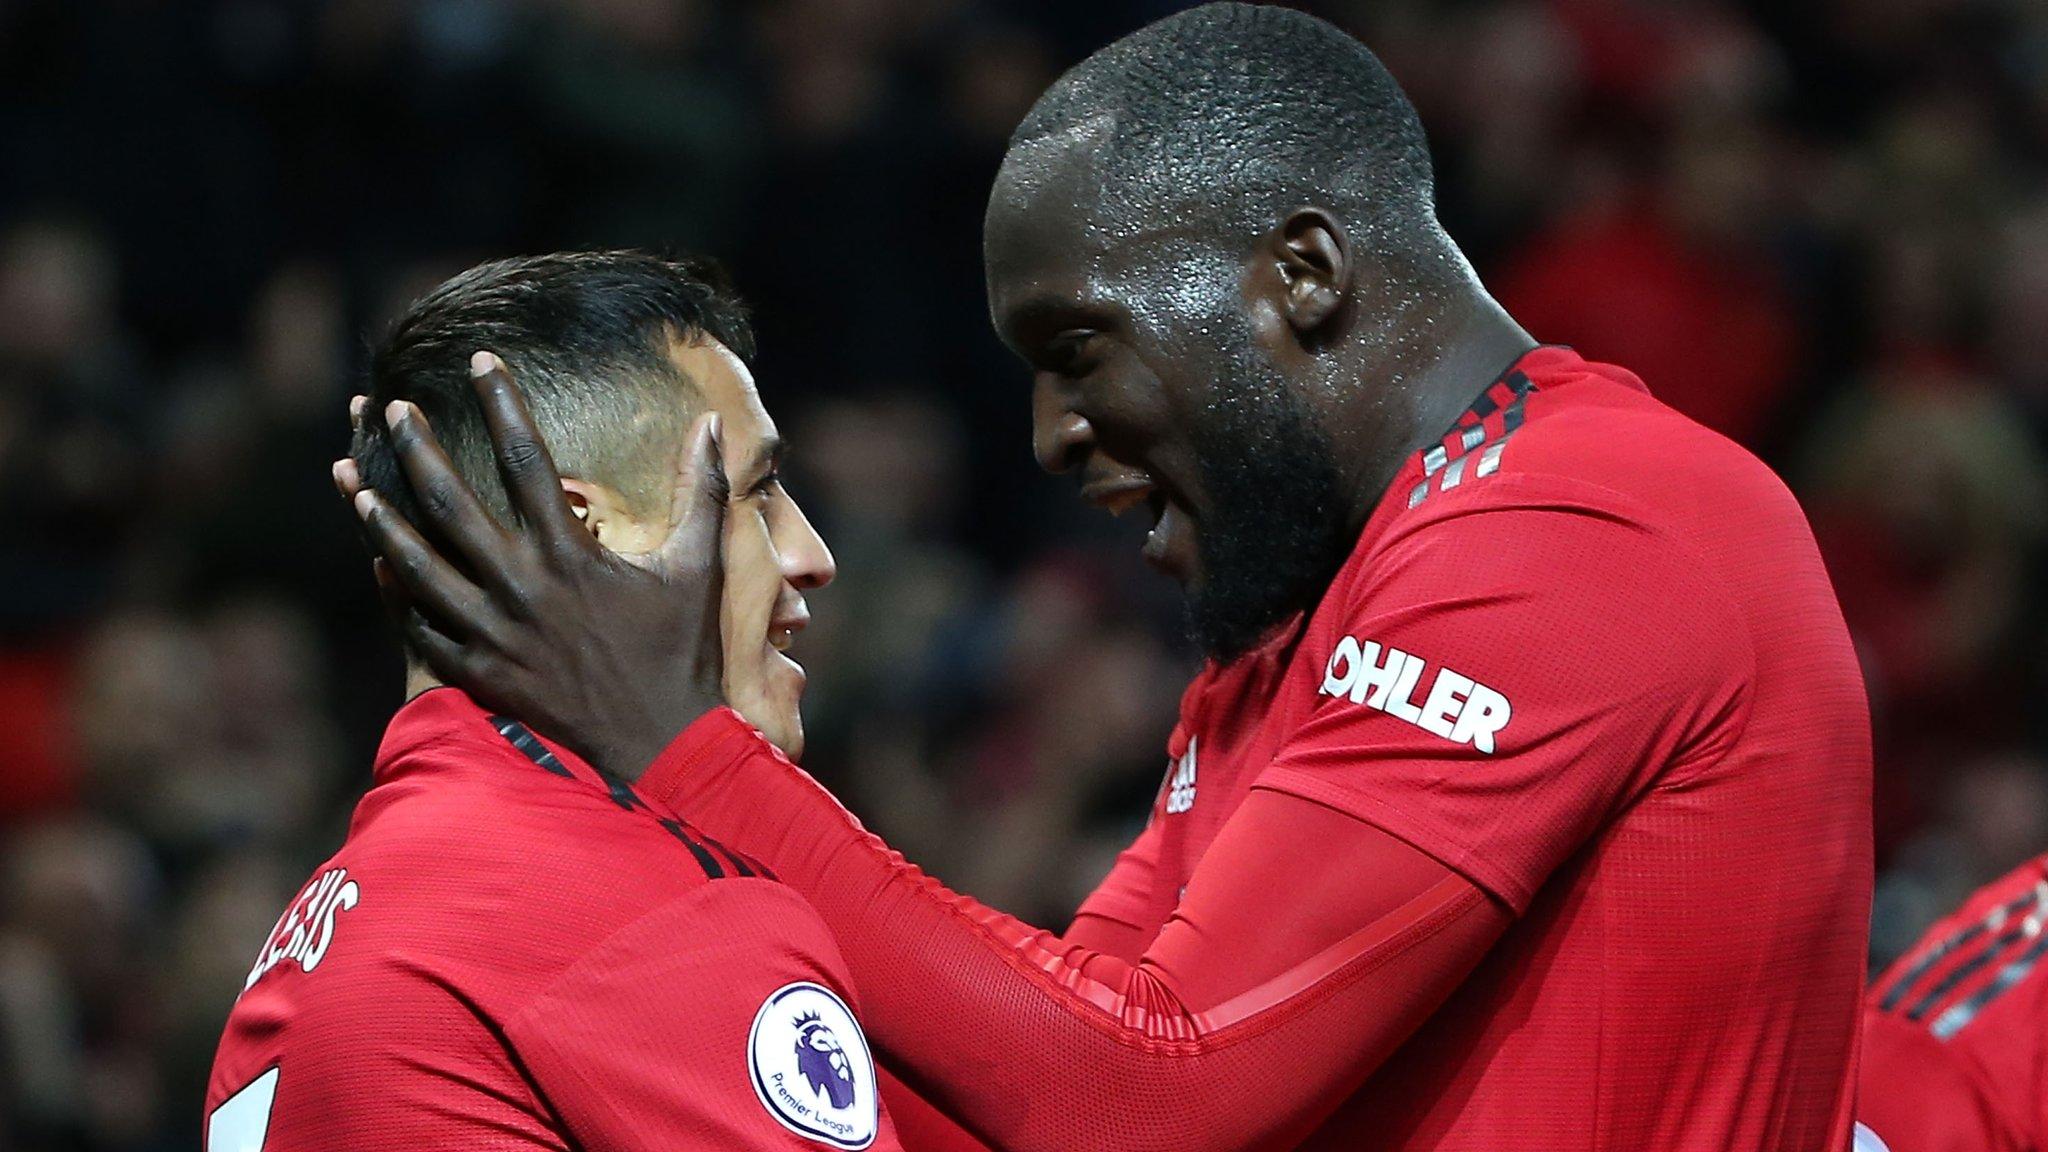 best service f1c68 334a9 Ole Gunnar Solskjaer  Man Utd boss hopes Romelu Lukaku   Alexis Sanchez   step up  - Ole Gunnar Solskjaer hopes Romelu Lukaku and Alexis Sanchez can